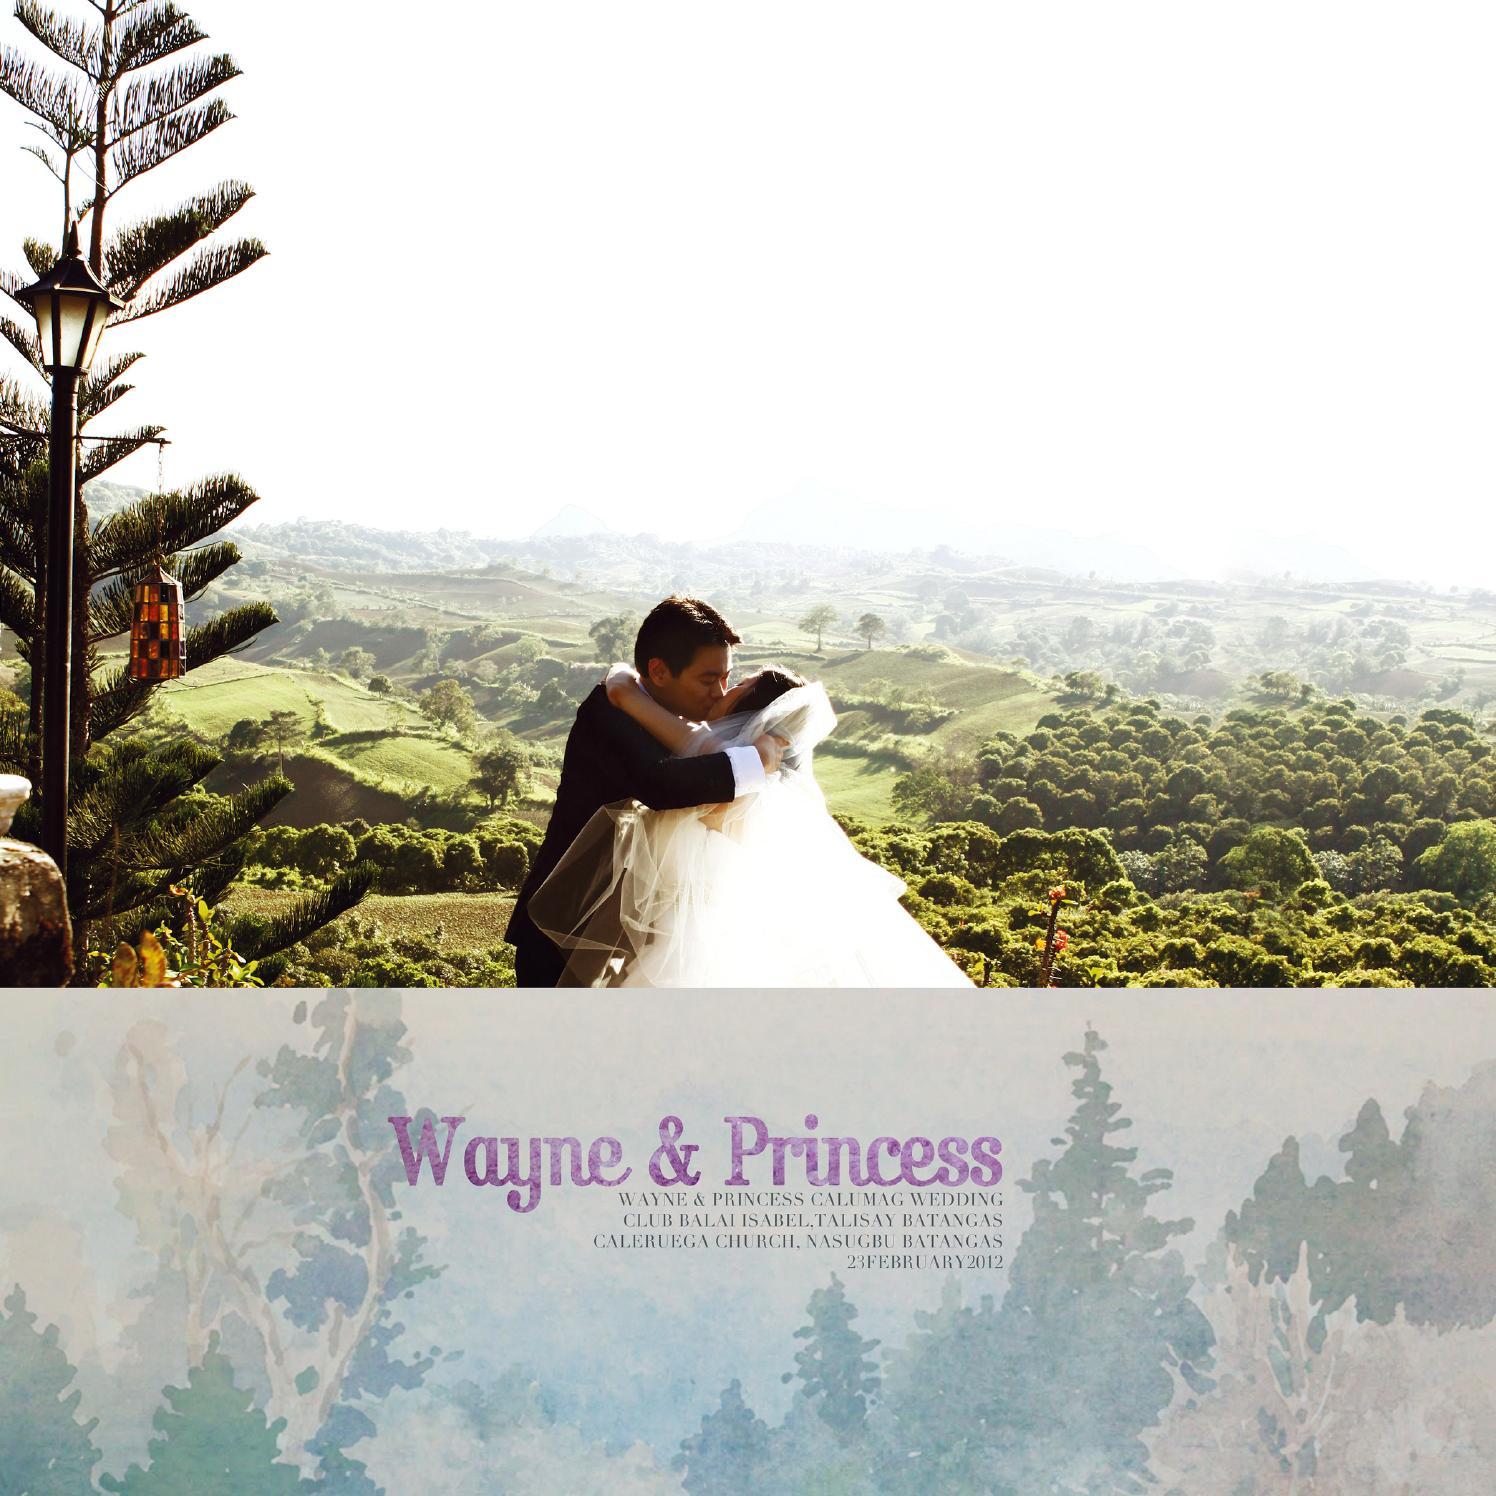 Wayne Marigold Princess Image: Wayne & Princess' Photobook By The Peppermint Media Co.